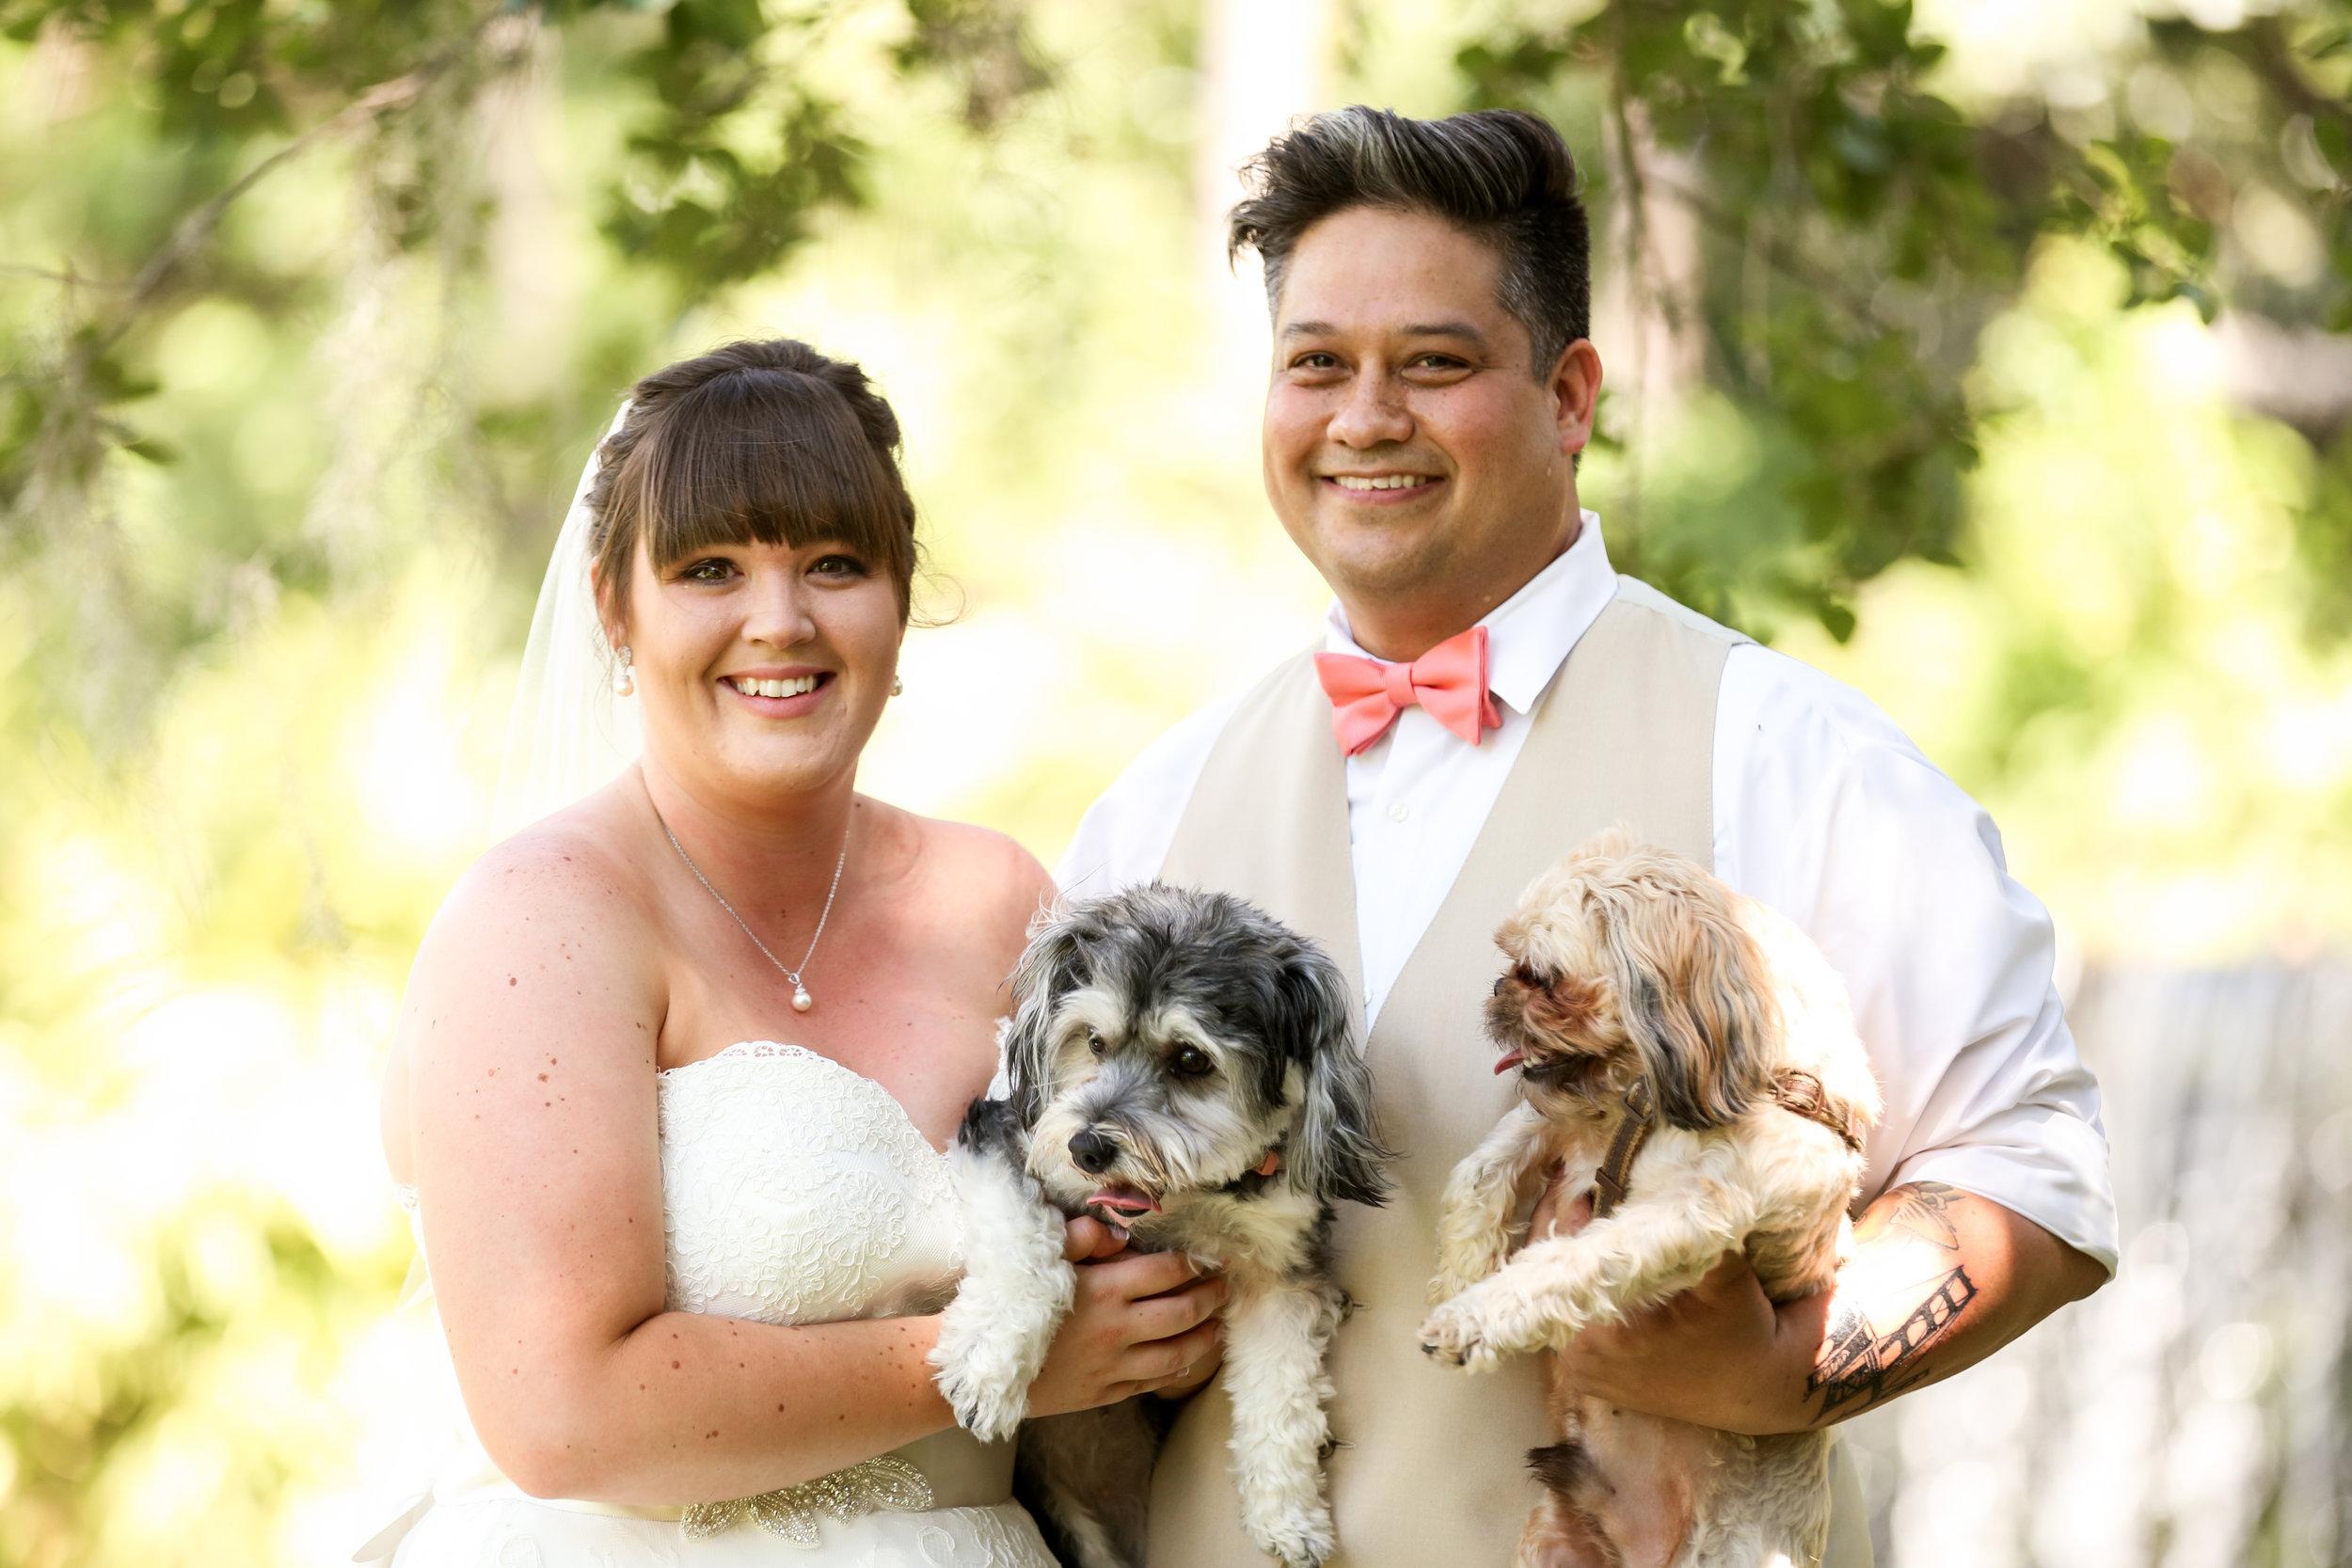 orlando-wedding-photographer-live-happy-studio-puppies-dogs-portrait-bride-groom-mission-inn-resort.jpg